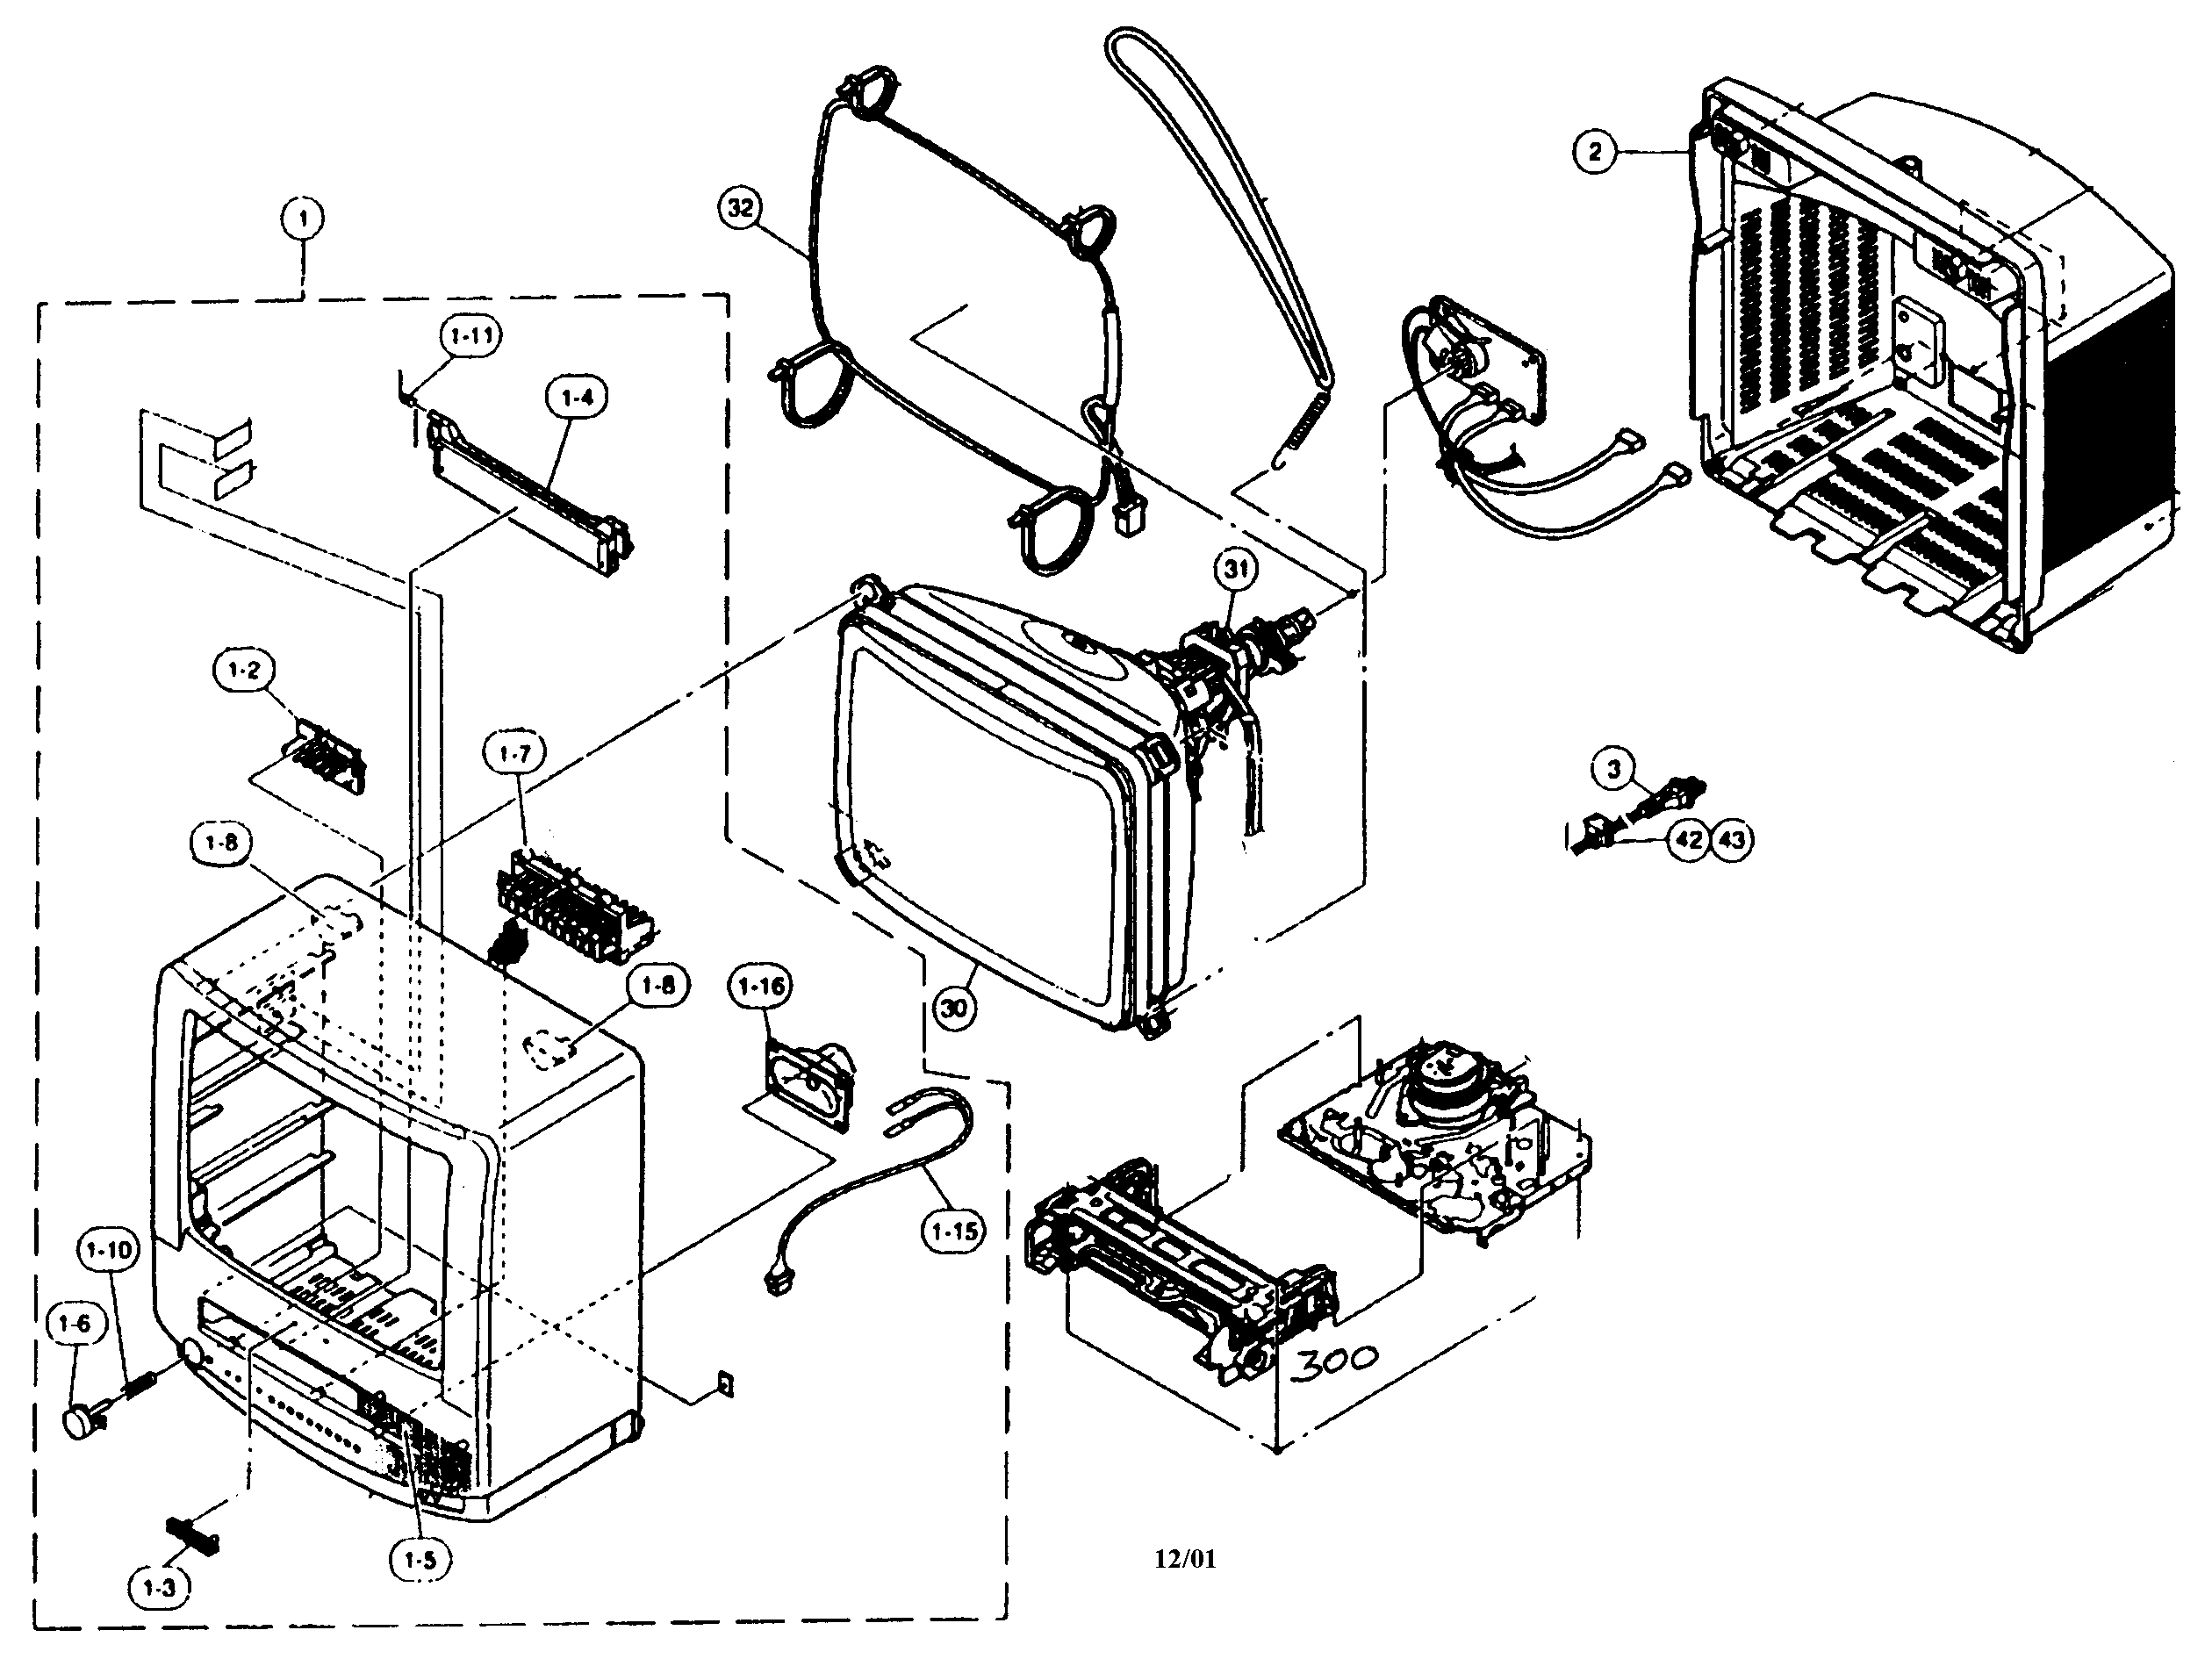 Cabinet Parts Diagram  U0026 Parts List For Model 13vtr100 Sharp